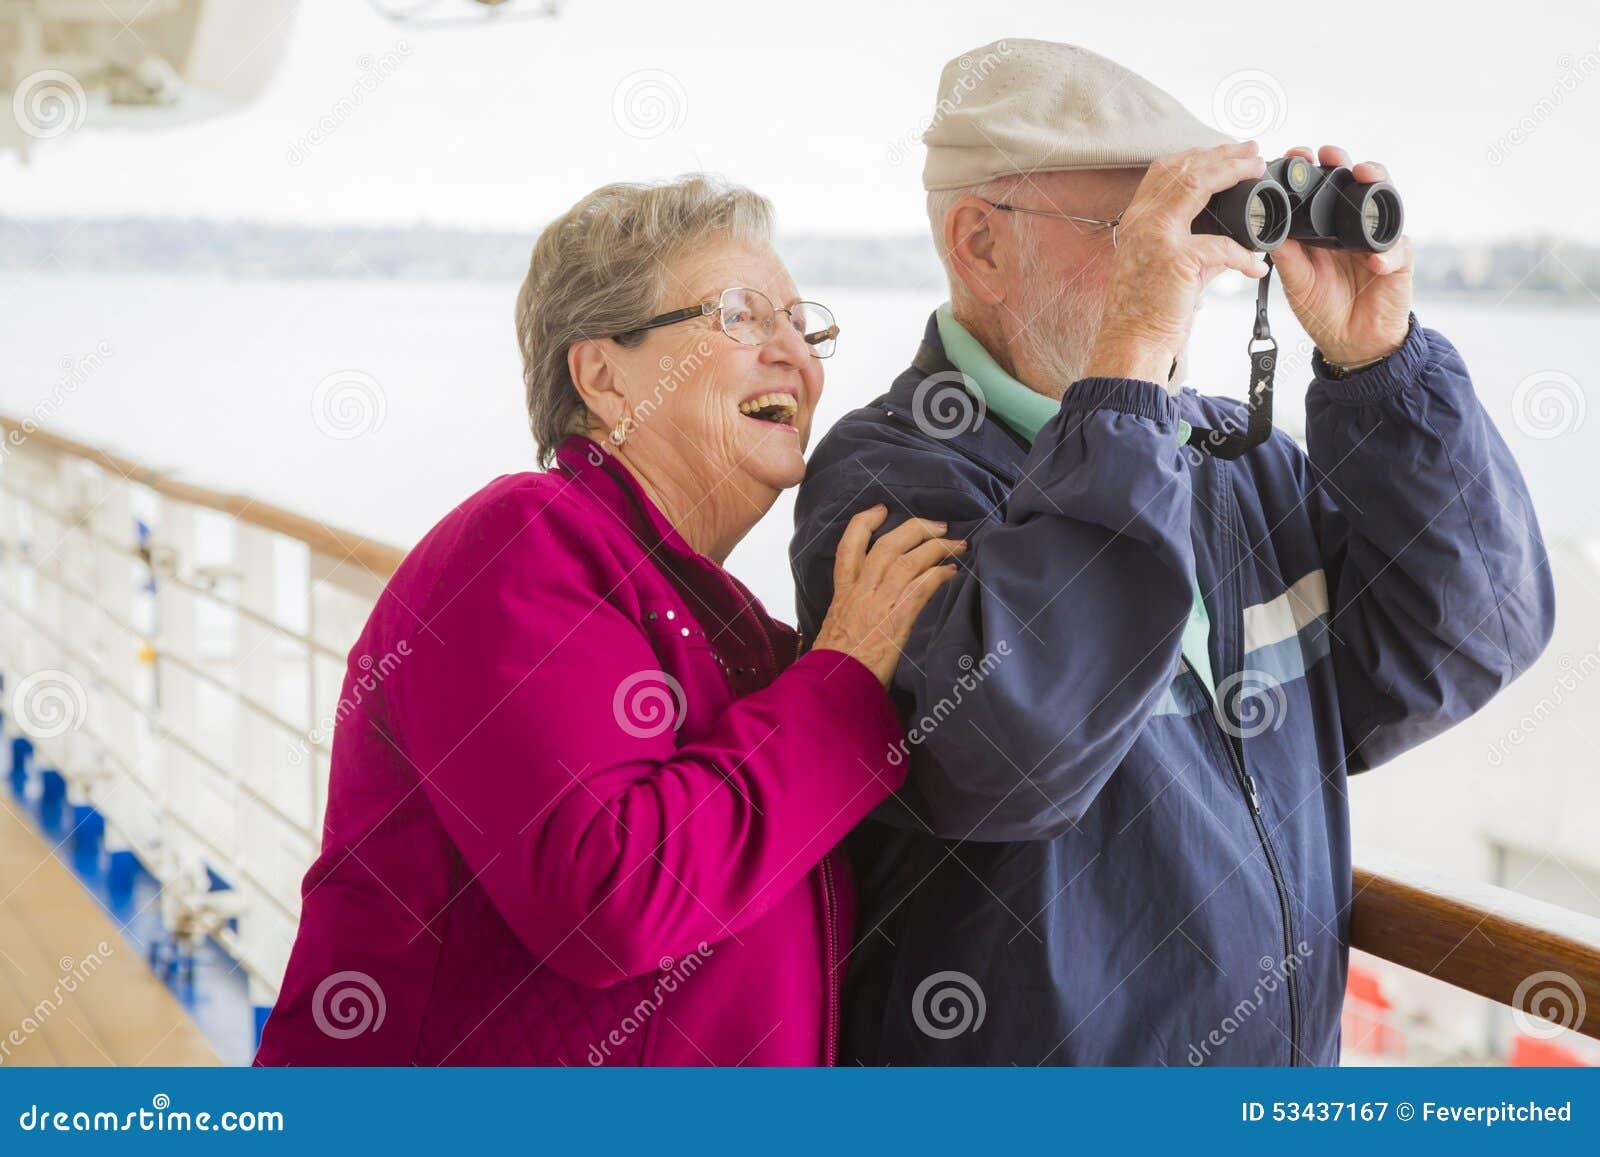 couple Adult adventurous